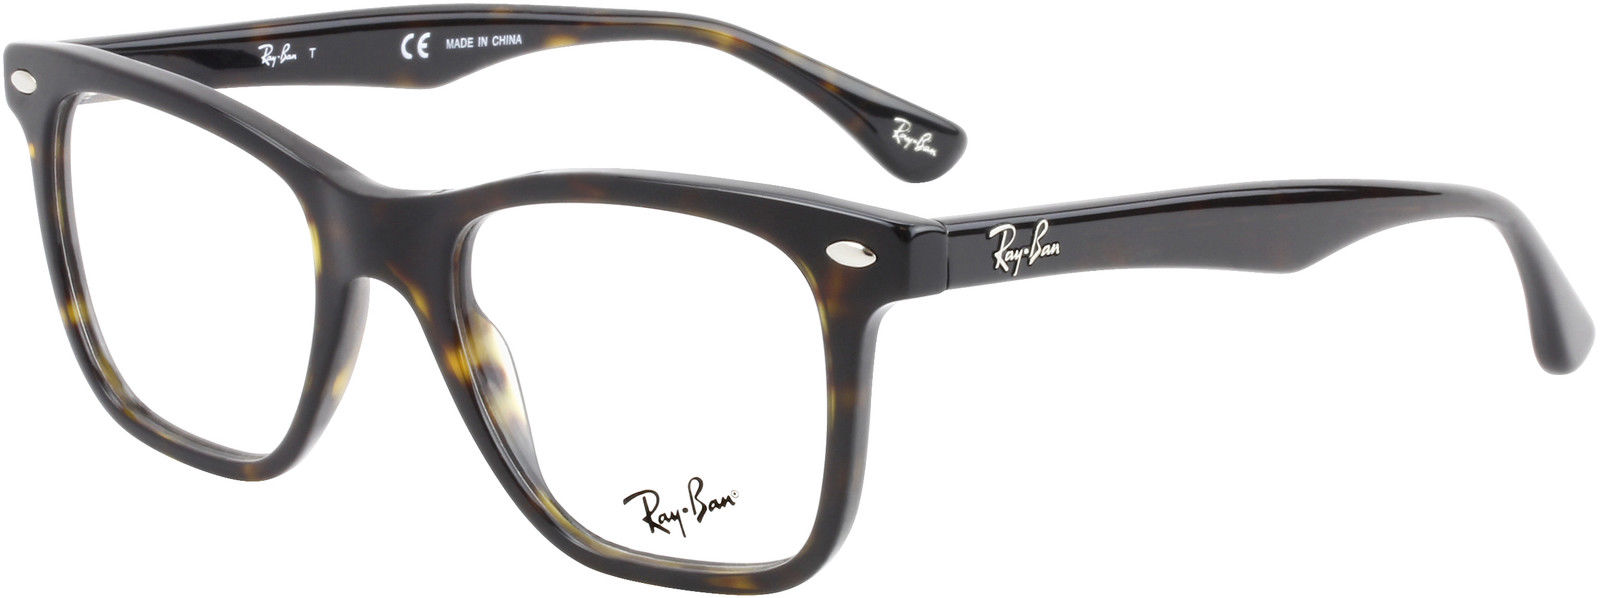 886e2b0c89 Ray Ban Eyeglasses Rb 5248 « Heritage Malta